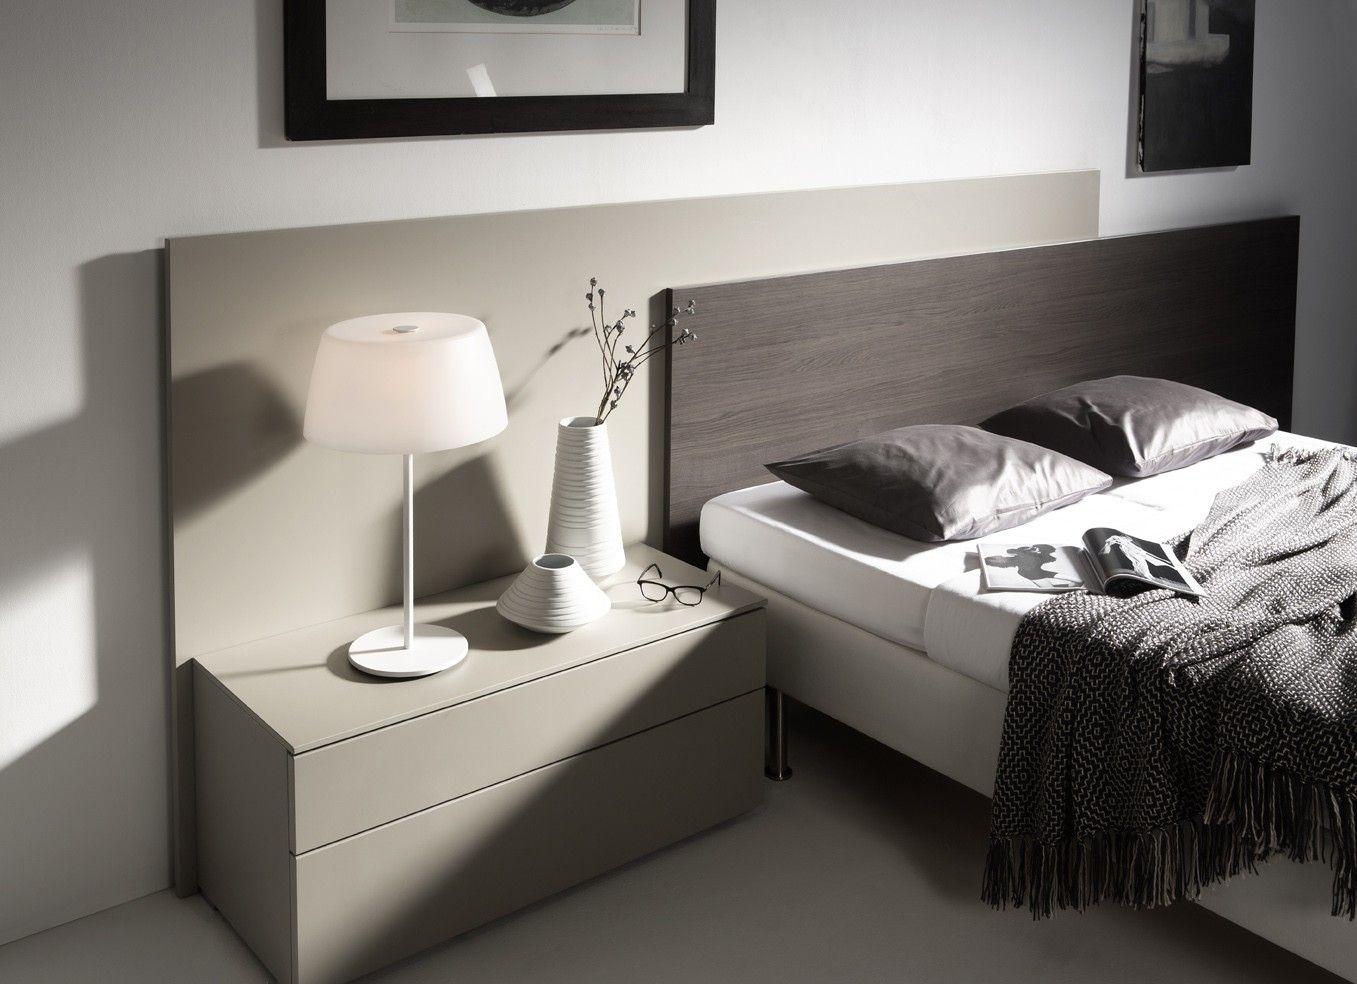 Full Size of Bett Rückwand 73 Primary Bettrckwand Japanisches Konfigurieren überlänge Graues Nischenrückwand Küche Mit Schubladen 160x200 Bette Starlet Stauraum Bett Bett Rückwand